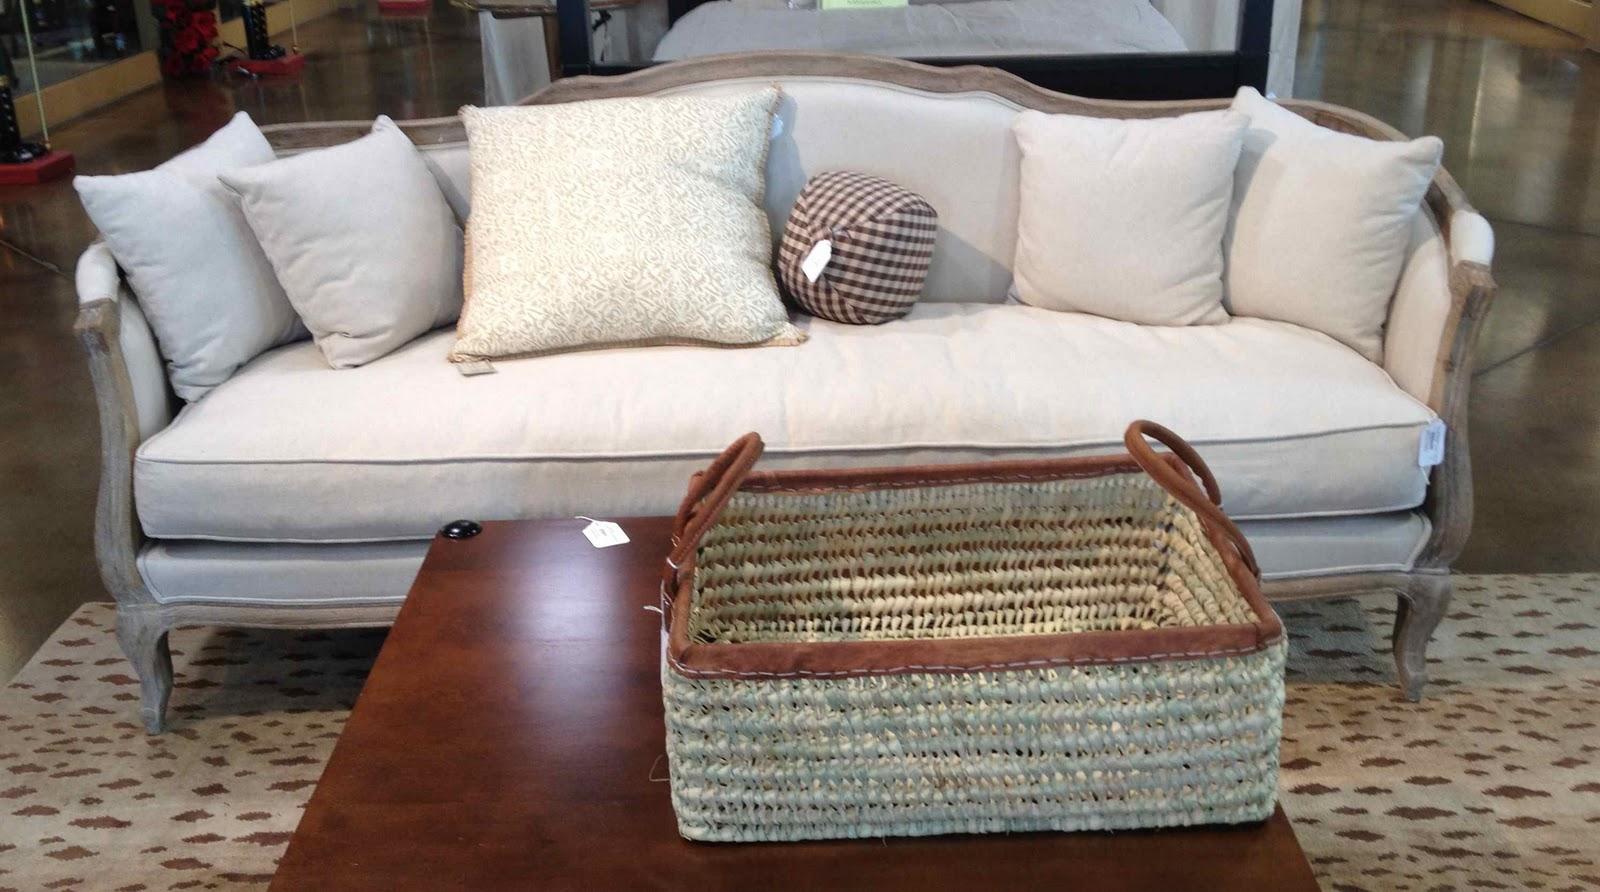 ballard designs sofa settee sofa design. Black Bedroom Furniture Sets. Home Design Ideas